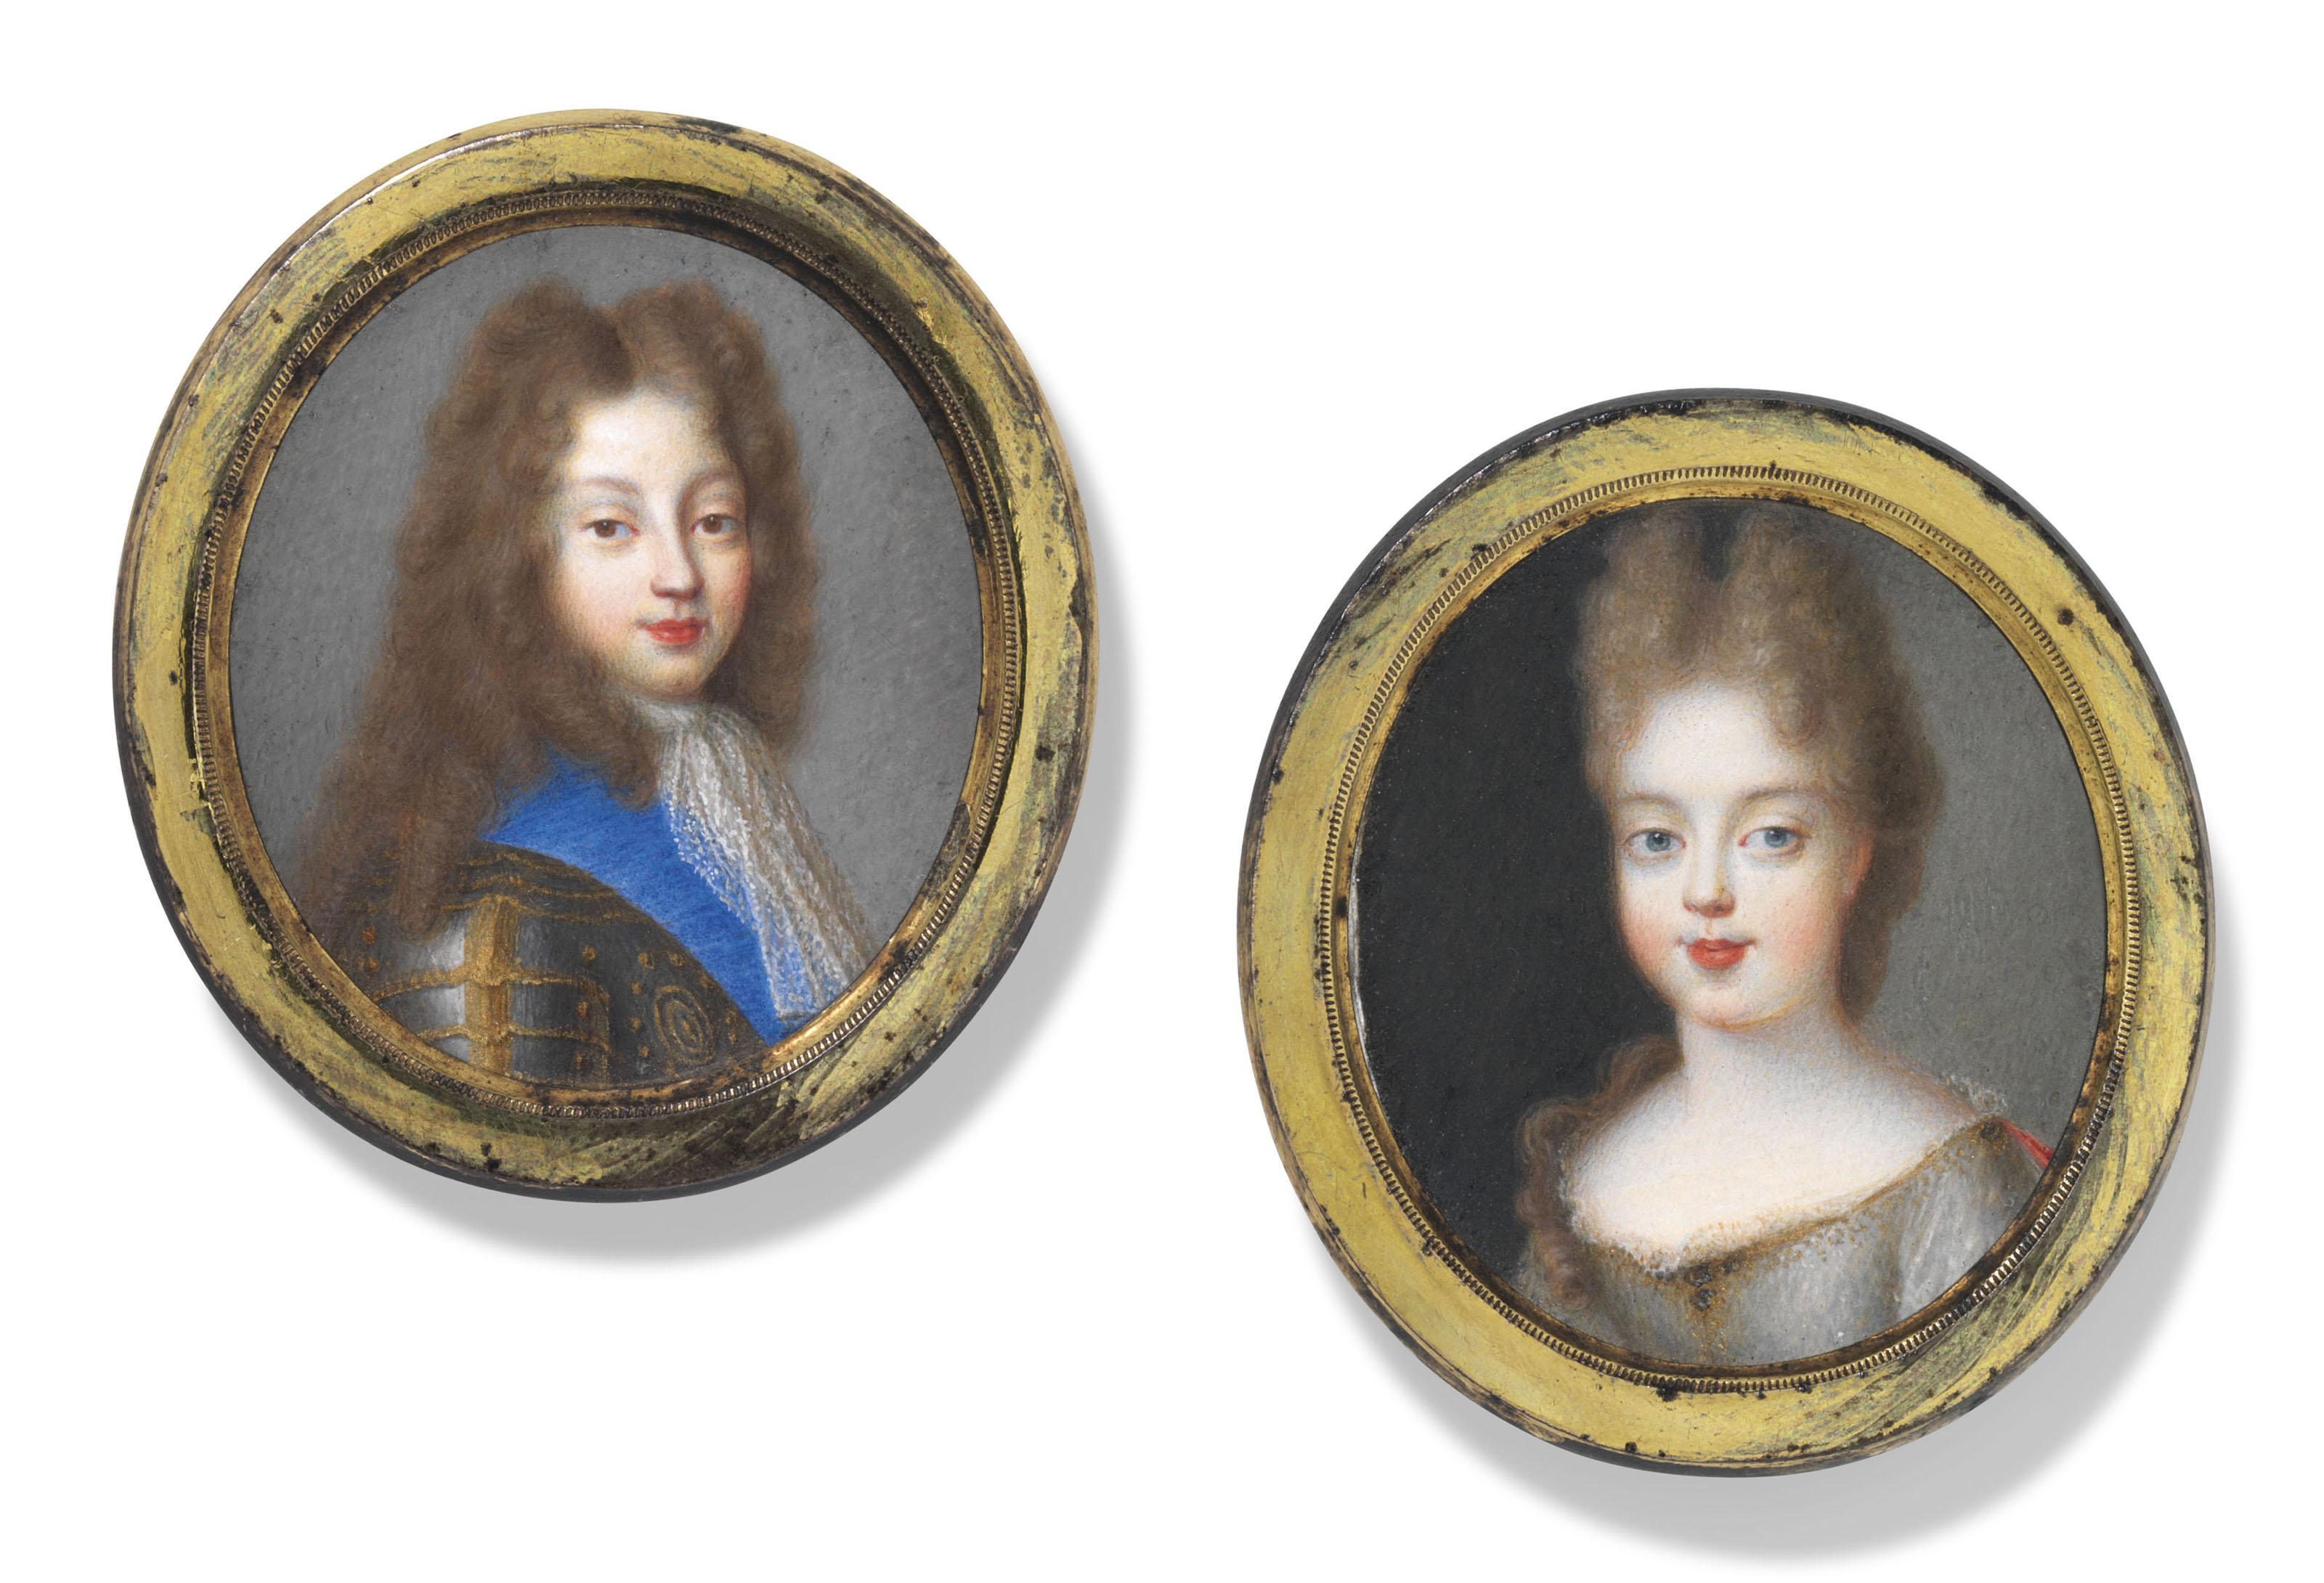 Jacques-Antoine Arlaud (Swiss, 1668-1746)